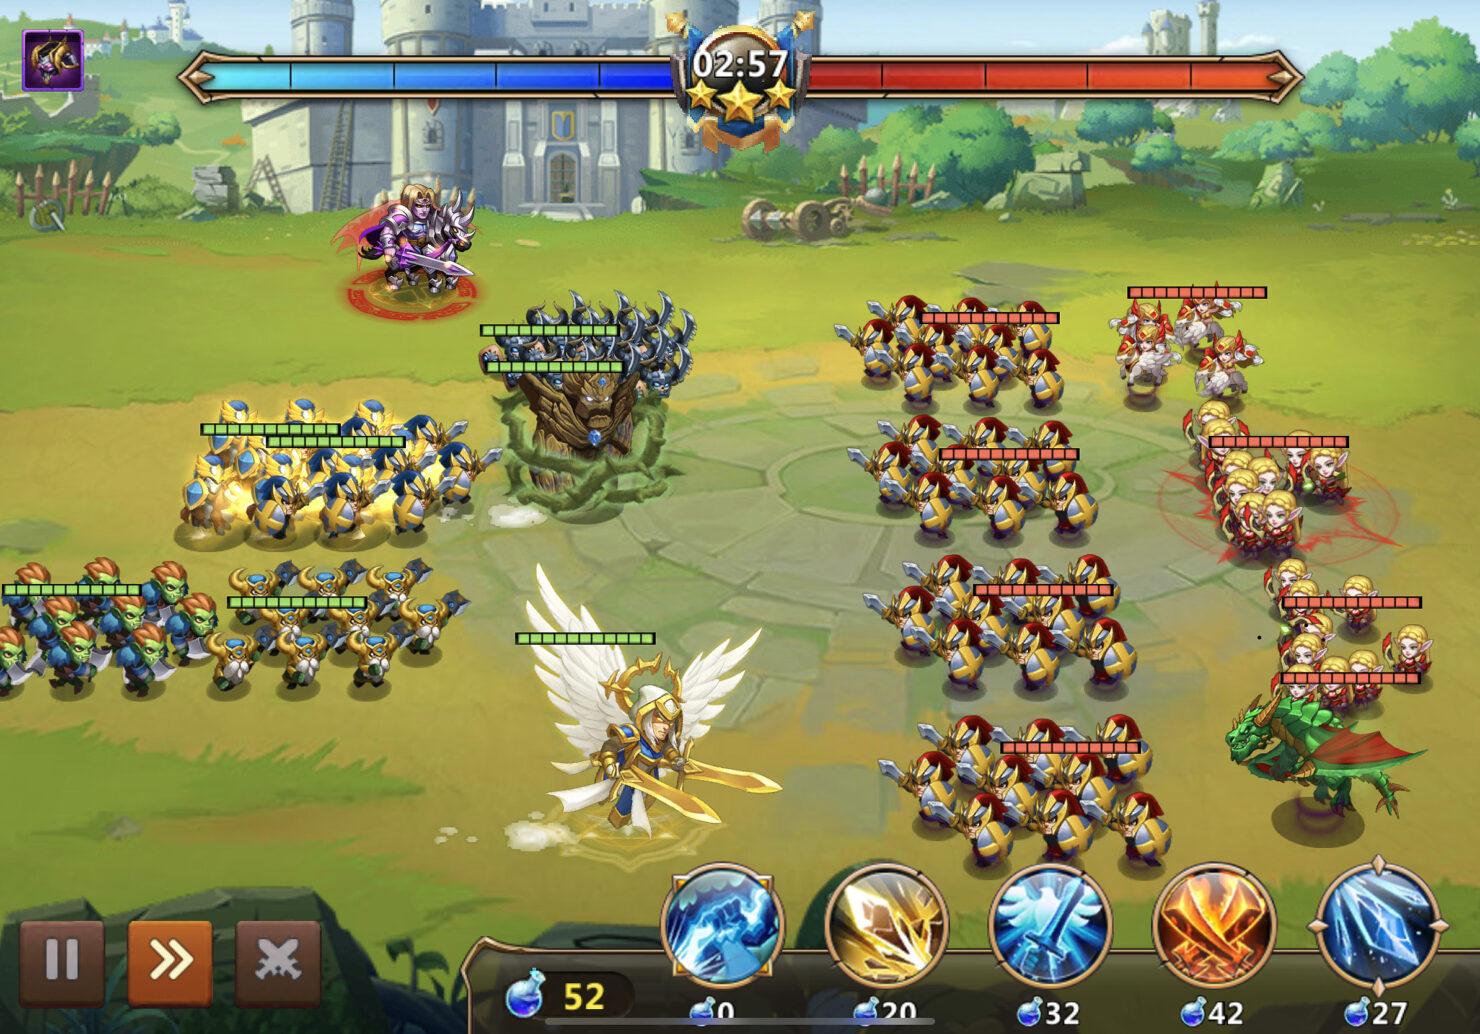 mmheoc_battle-gameplay_2388x1668_en